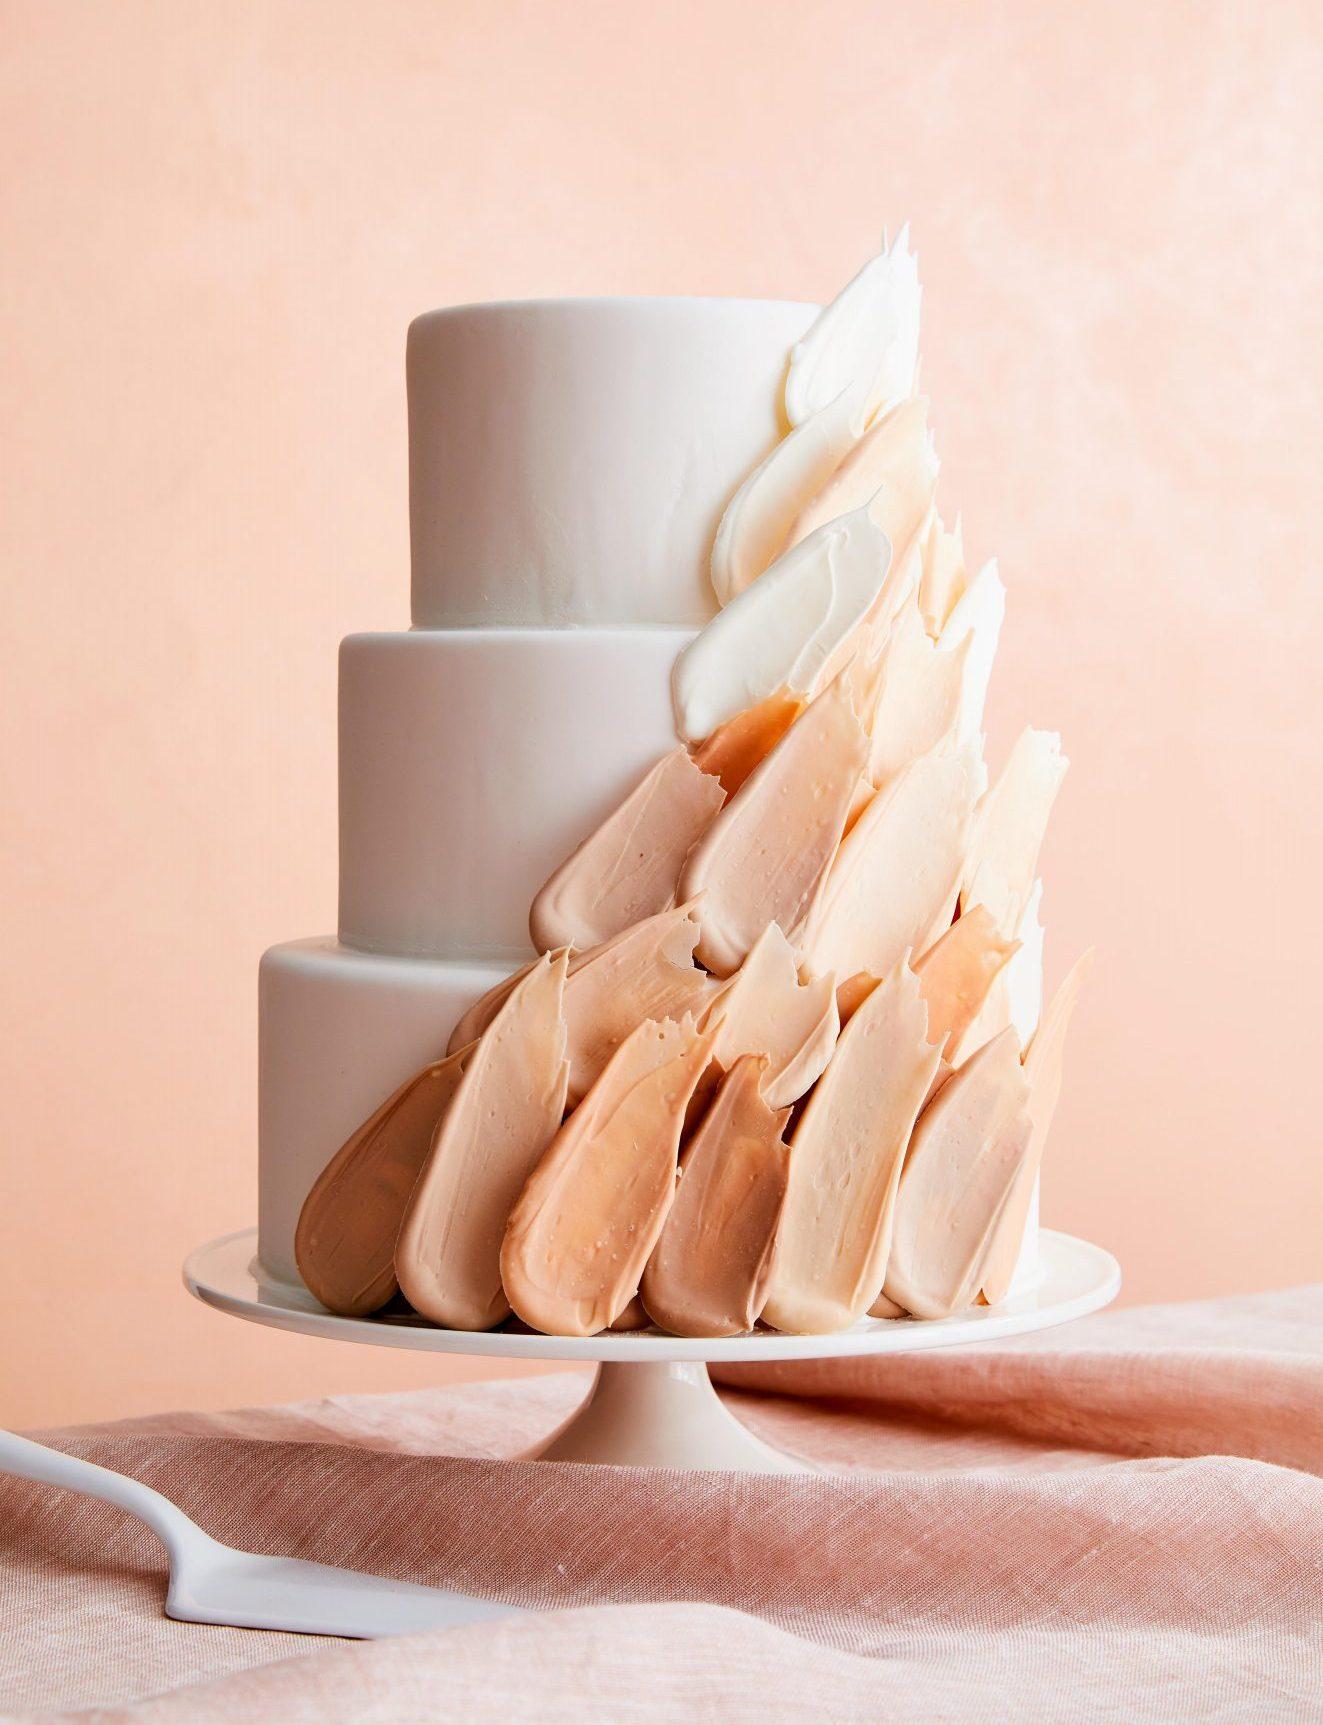 fondant-covered spice cake